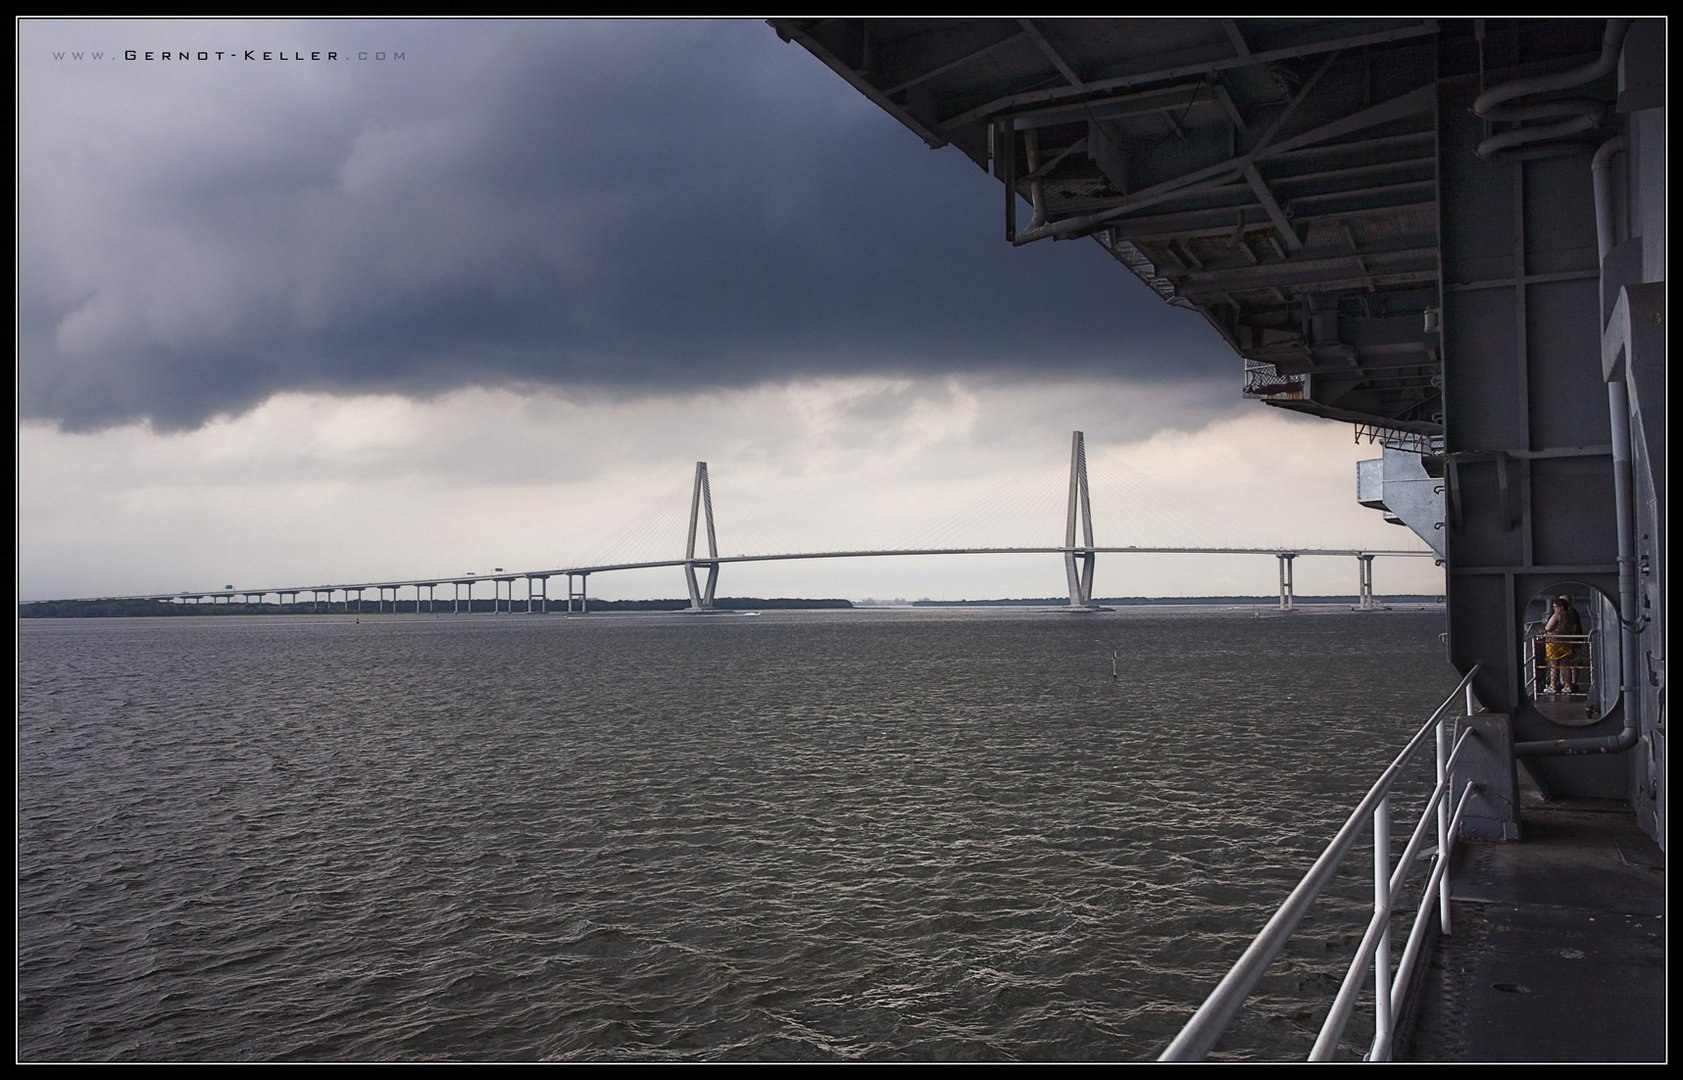 07439 - Heavy Rain over the Yorktown, Charleston